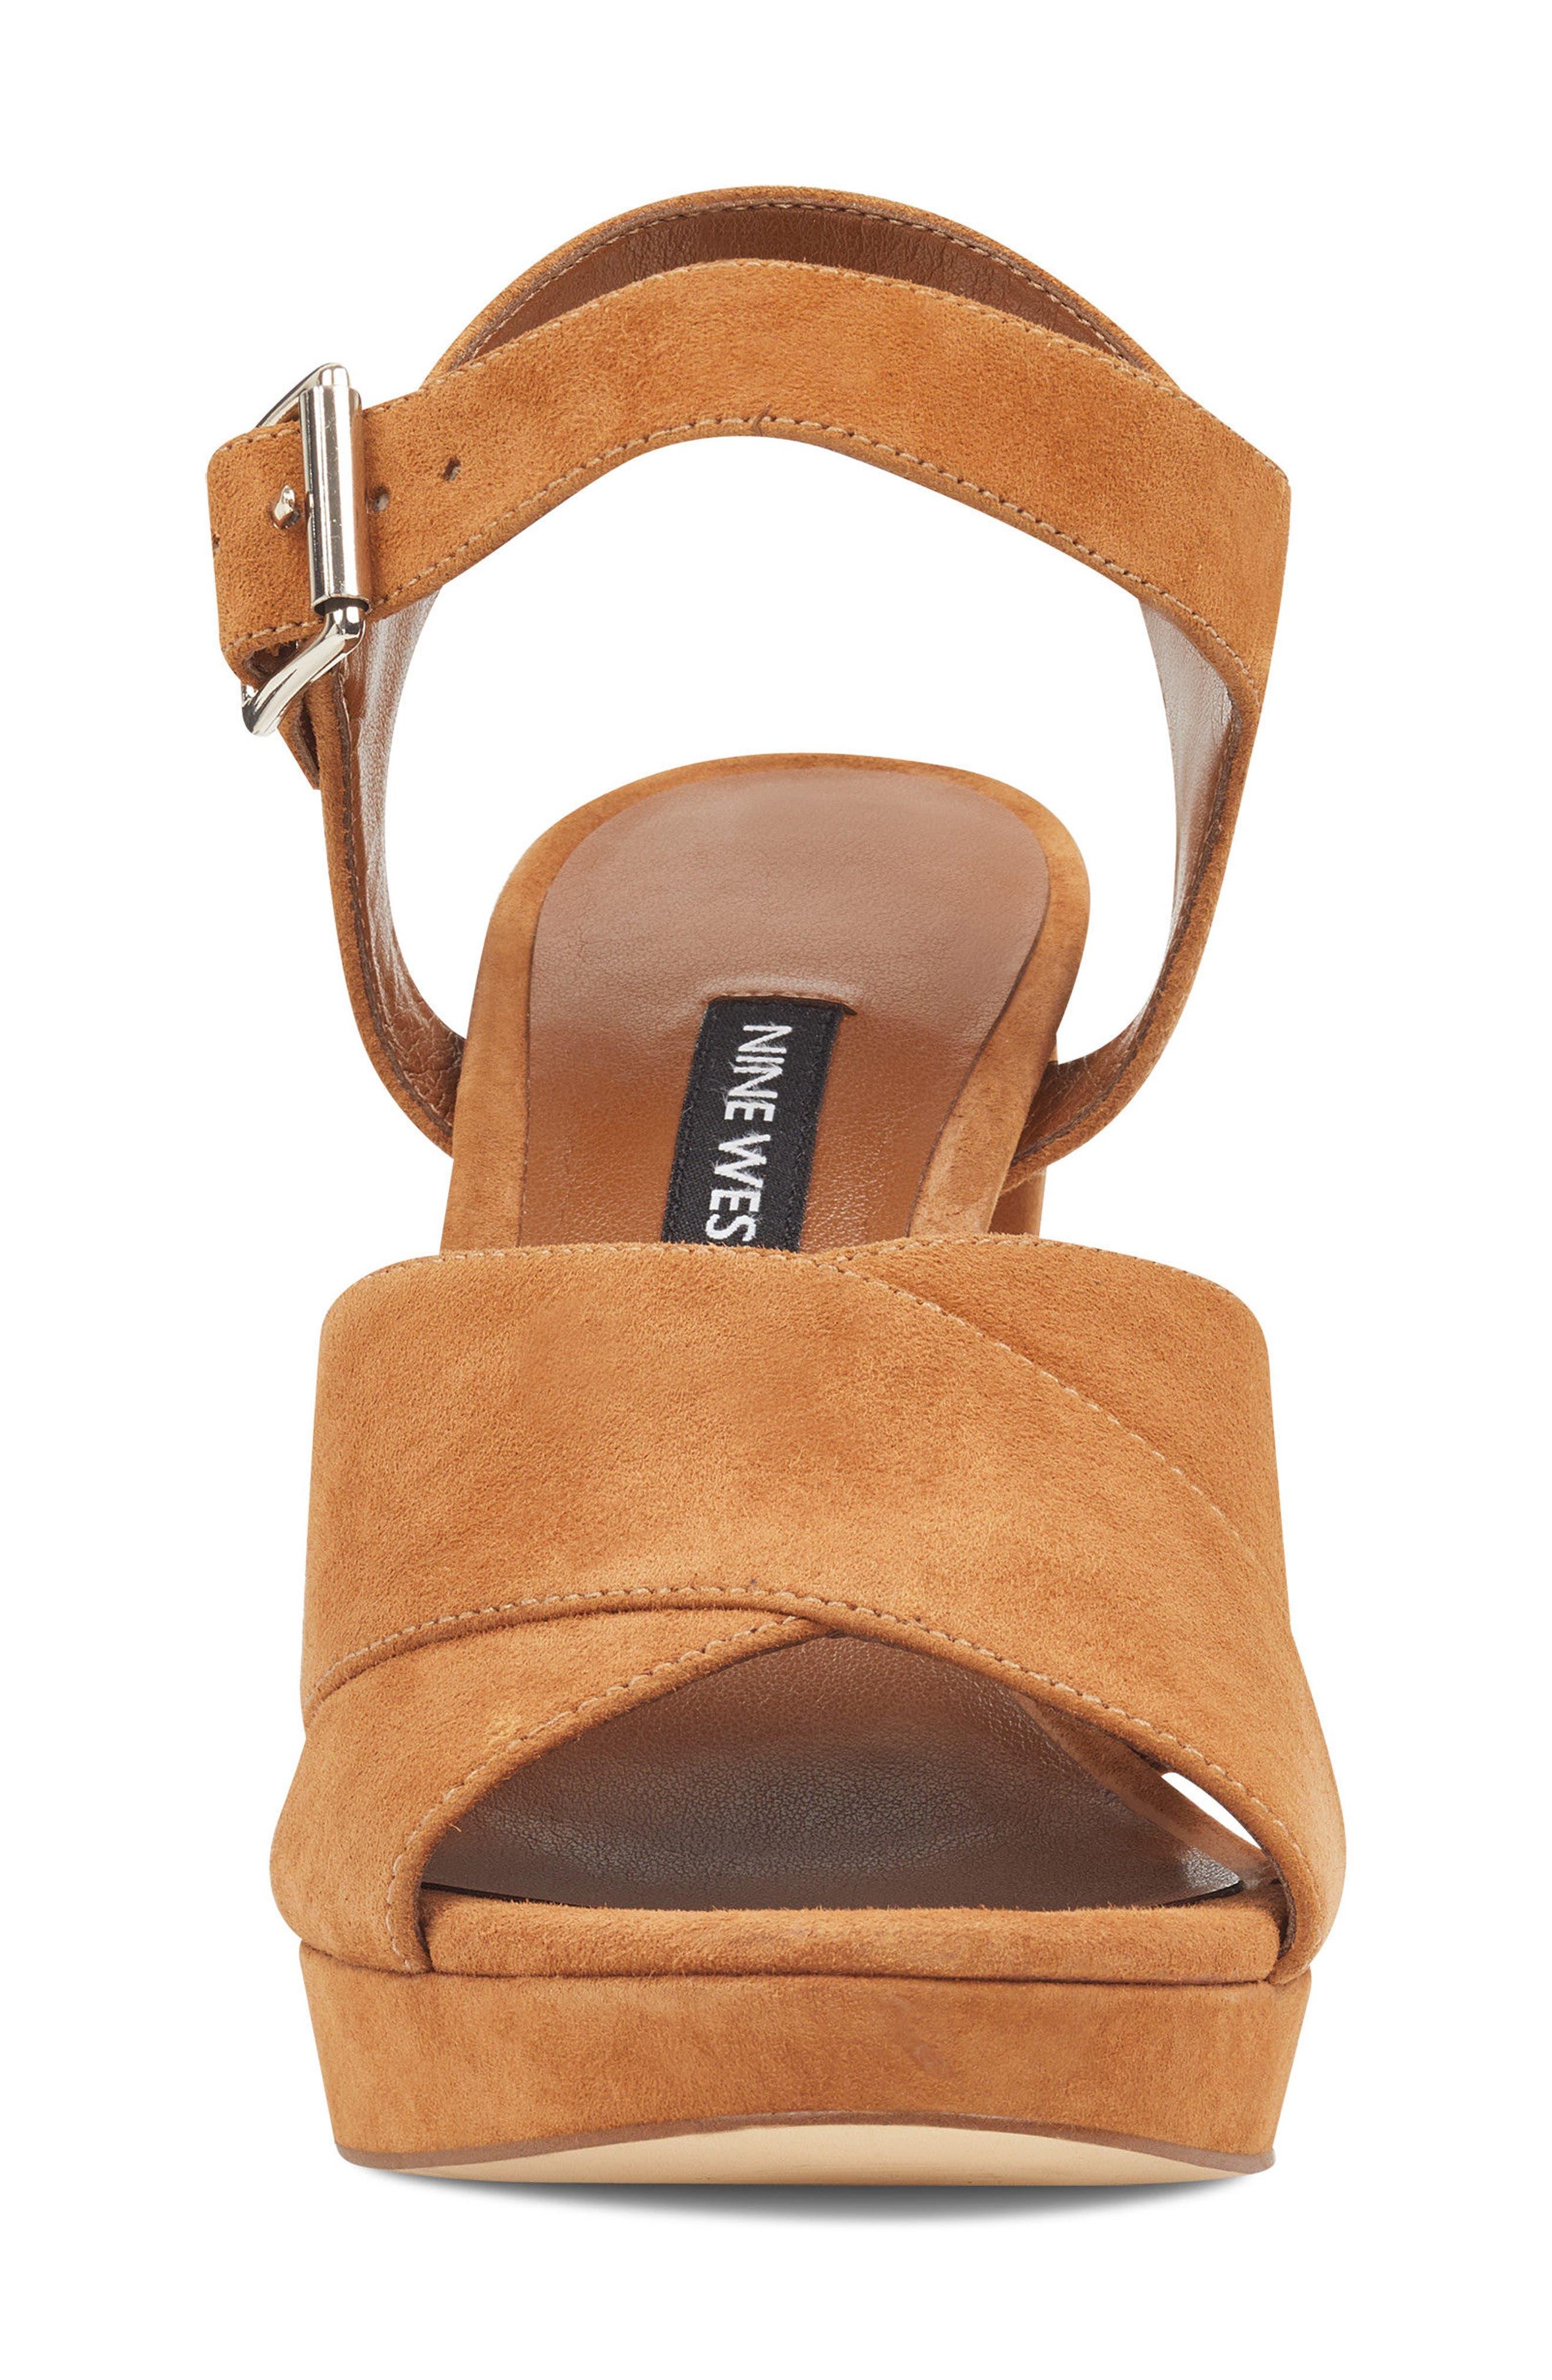 Jimar Platform Sandal,                             Alternate thumbnail 4, color,                             DARK NATURAL SUEDE